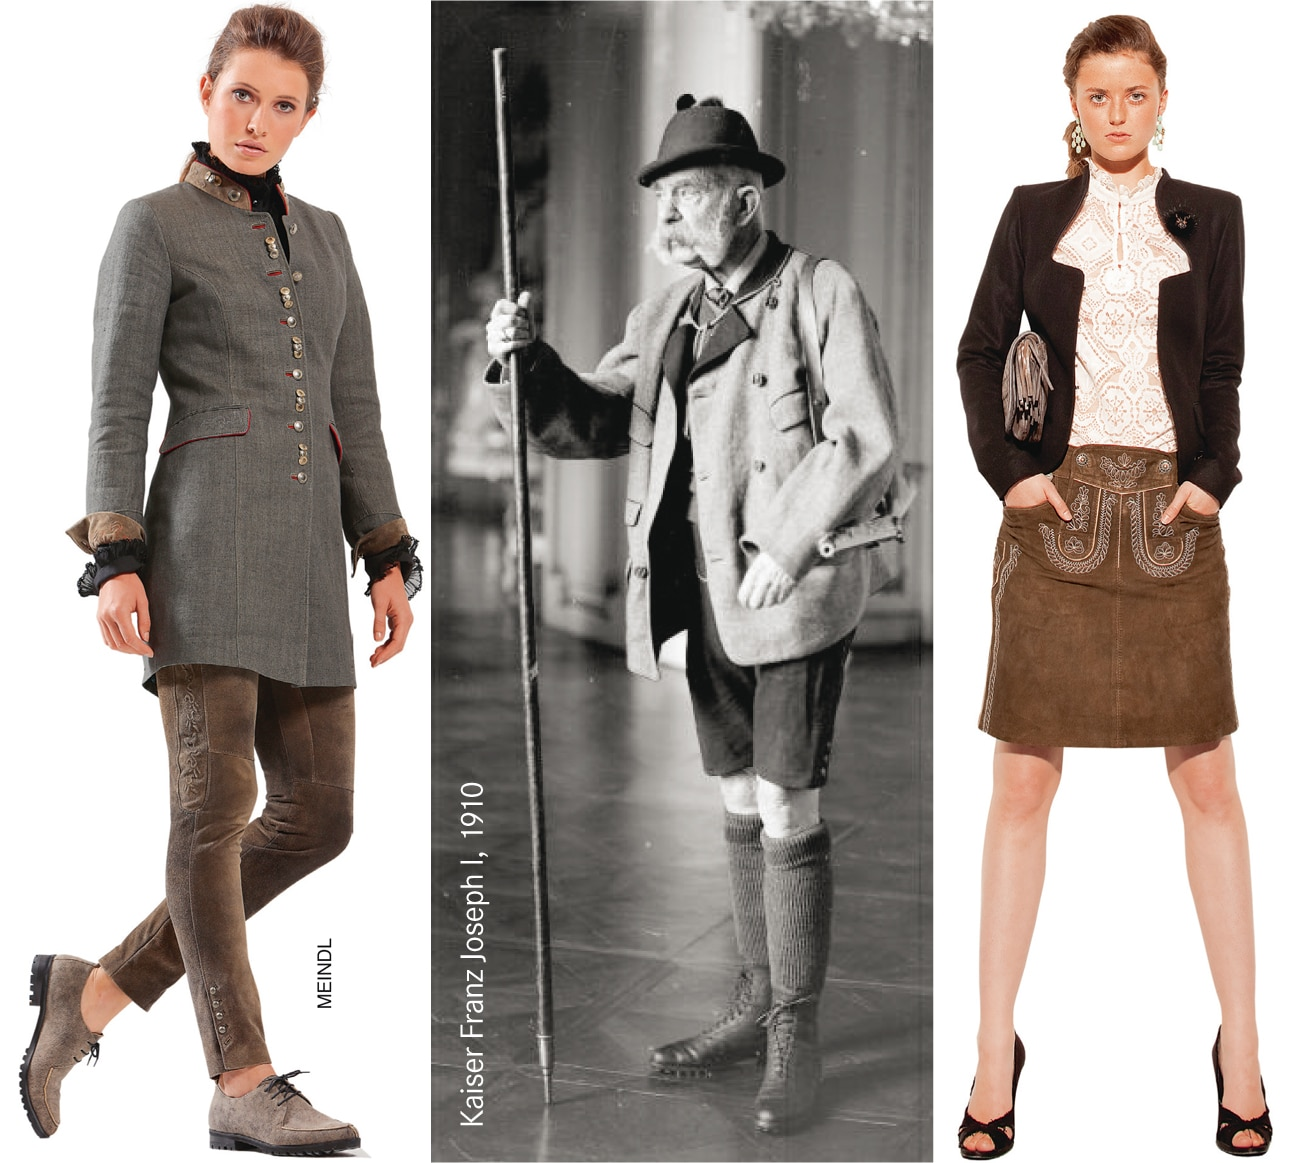 Verschiedene Varianten der Lederhose